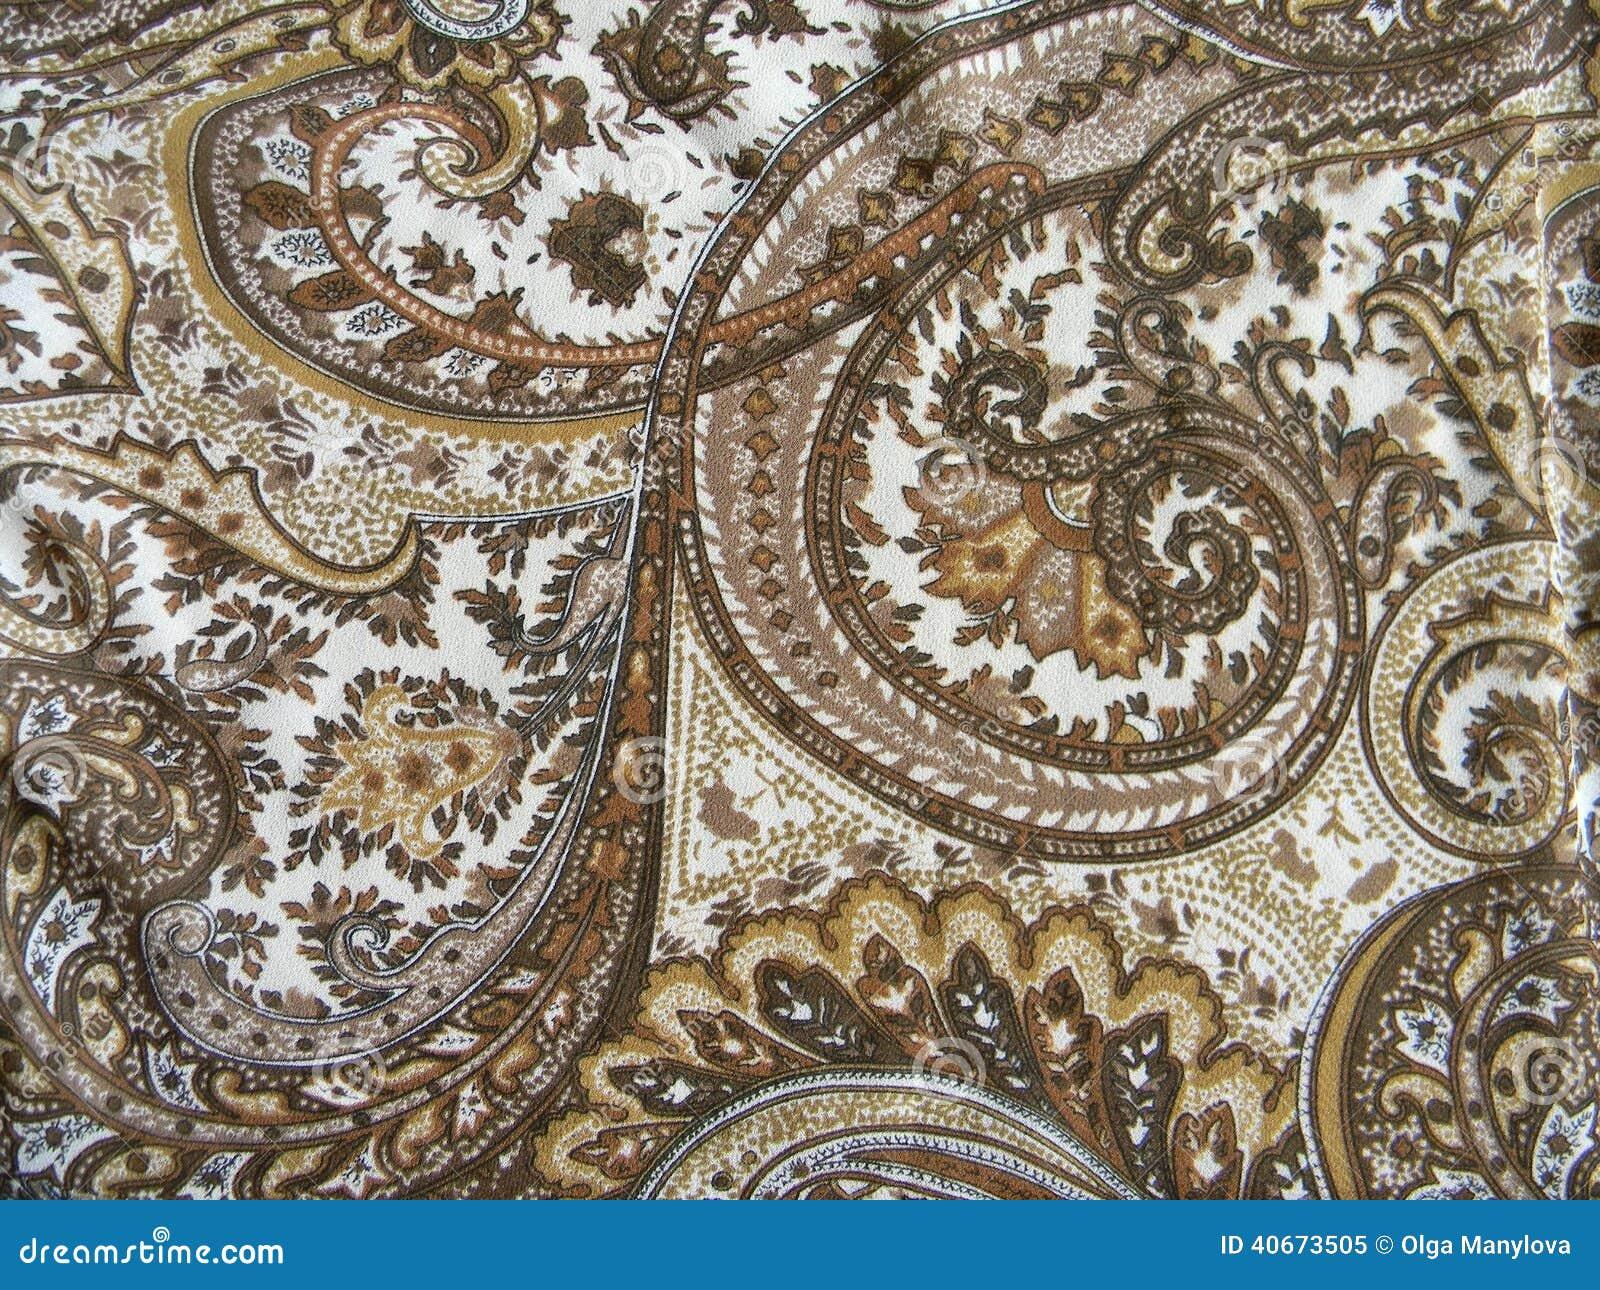 tissu avec le dessin est classique image stock image 40673505. Black Bedroom Furniture Sets. Home Design Ideas